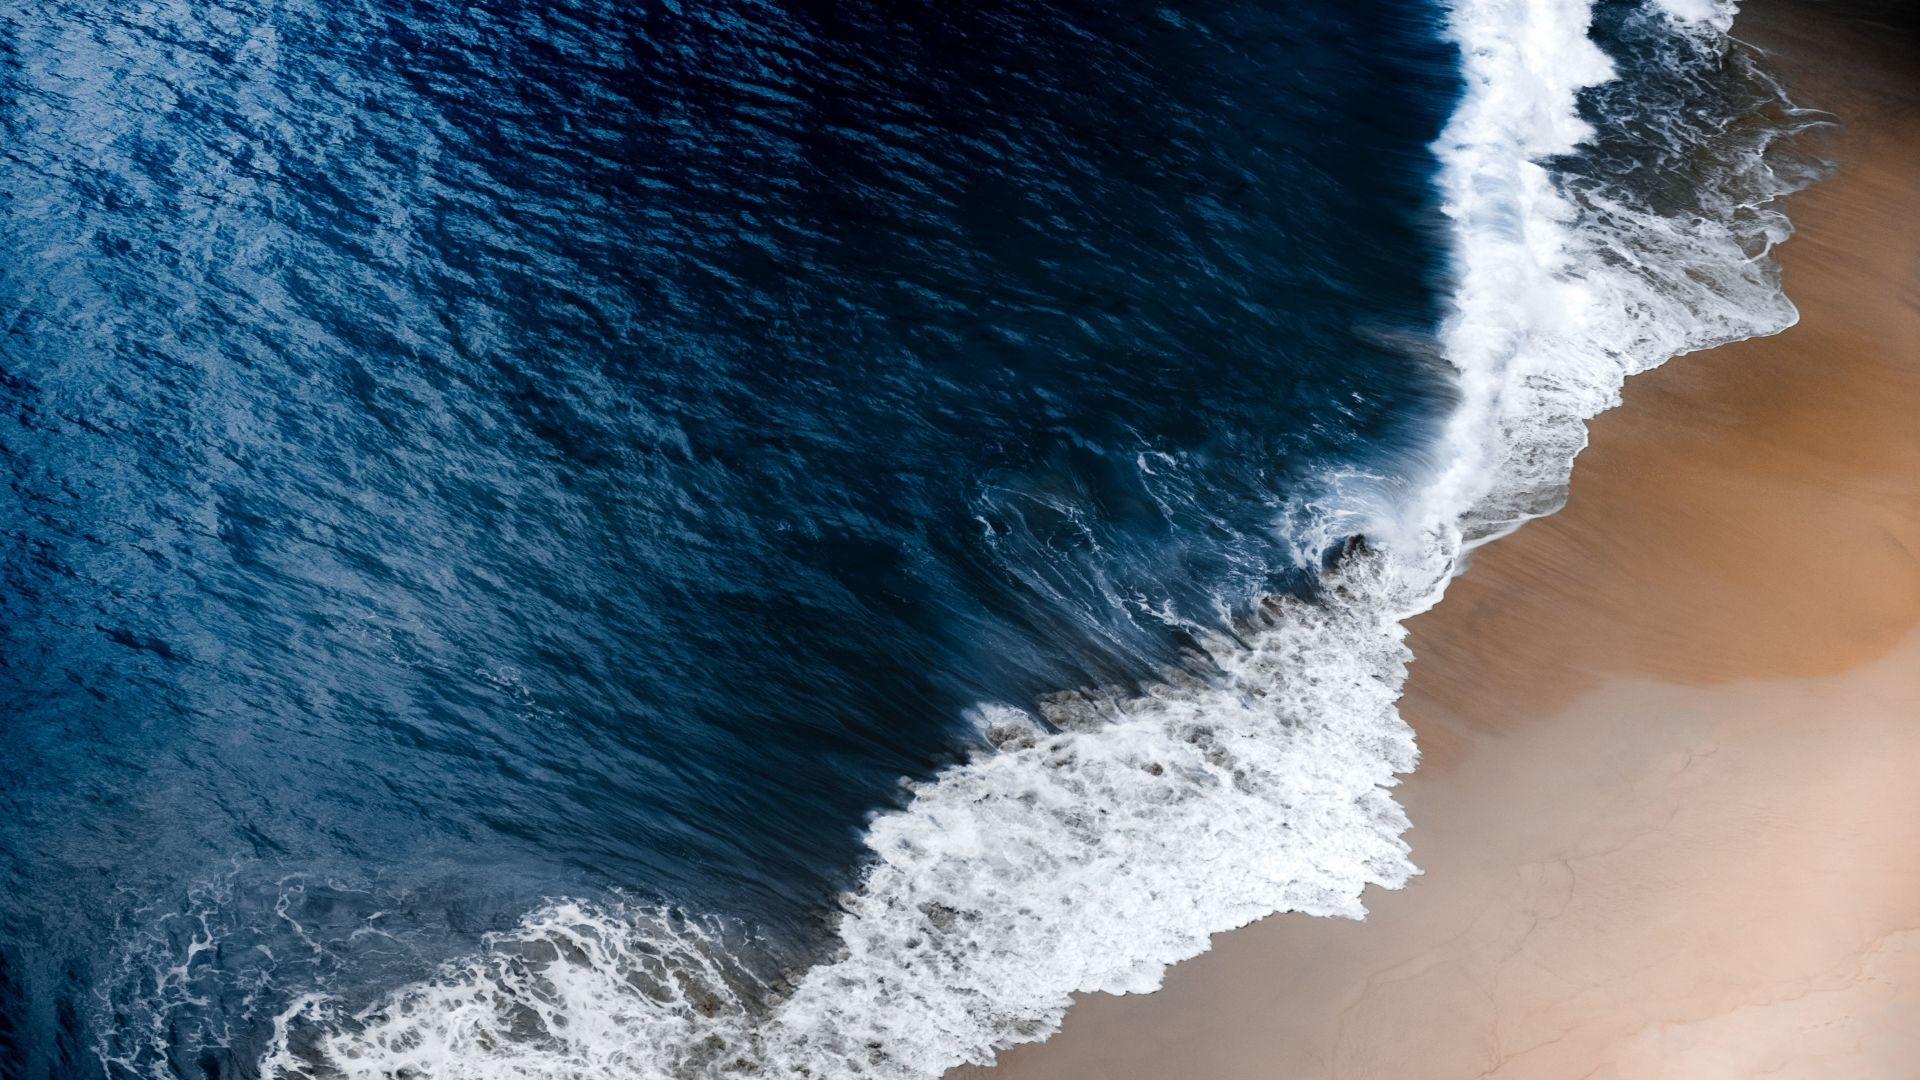 Wallpaper Bali's beach, sea waves, 4k